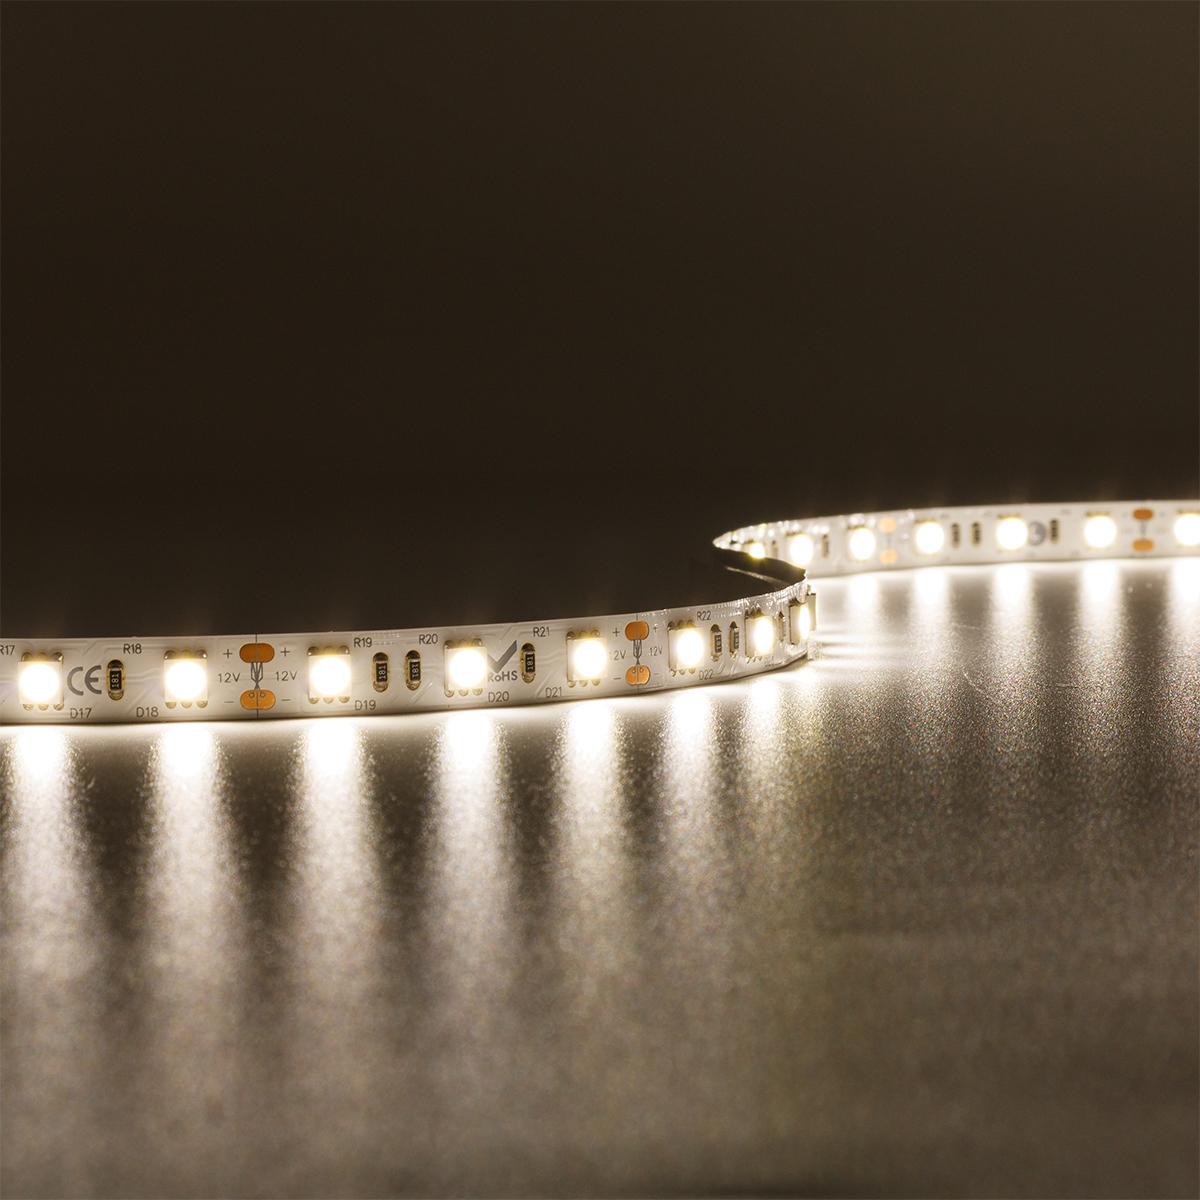 Strip Neutralweiß 12V LED Streifen 5M 14,4W/m 60LED/m 10mm IP20 4000K